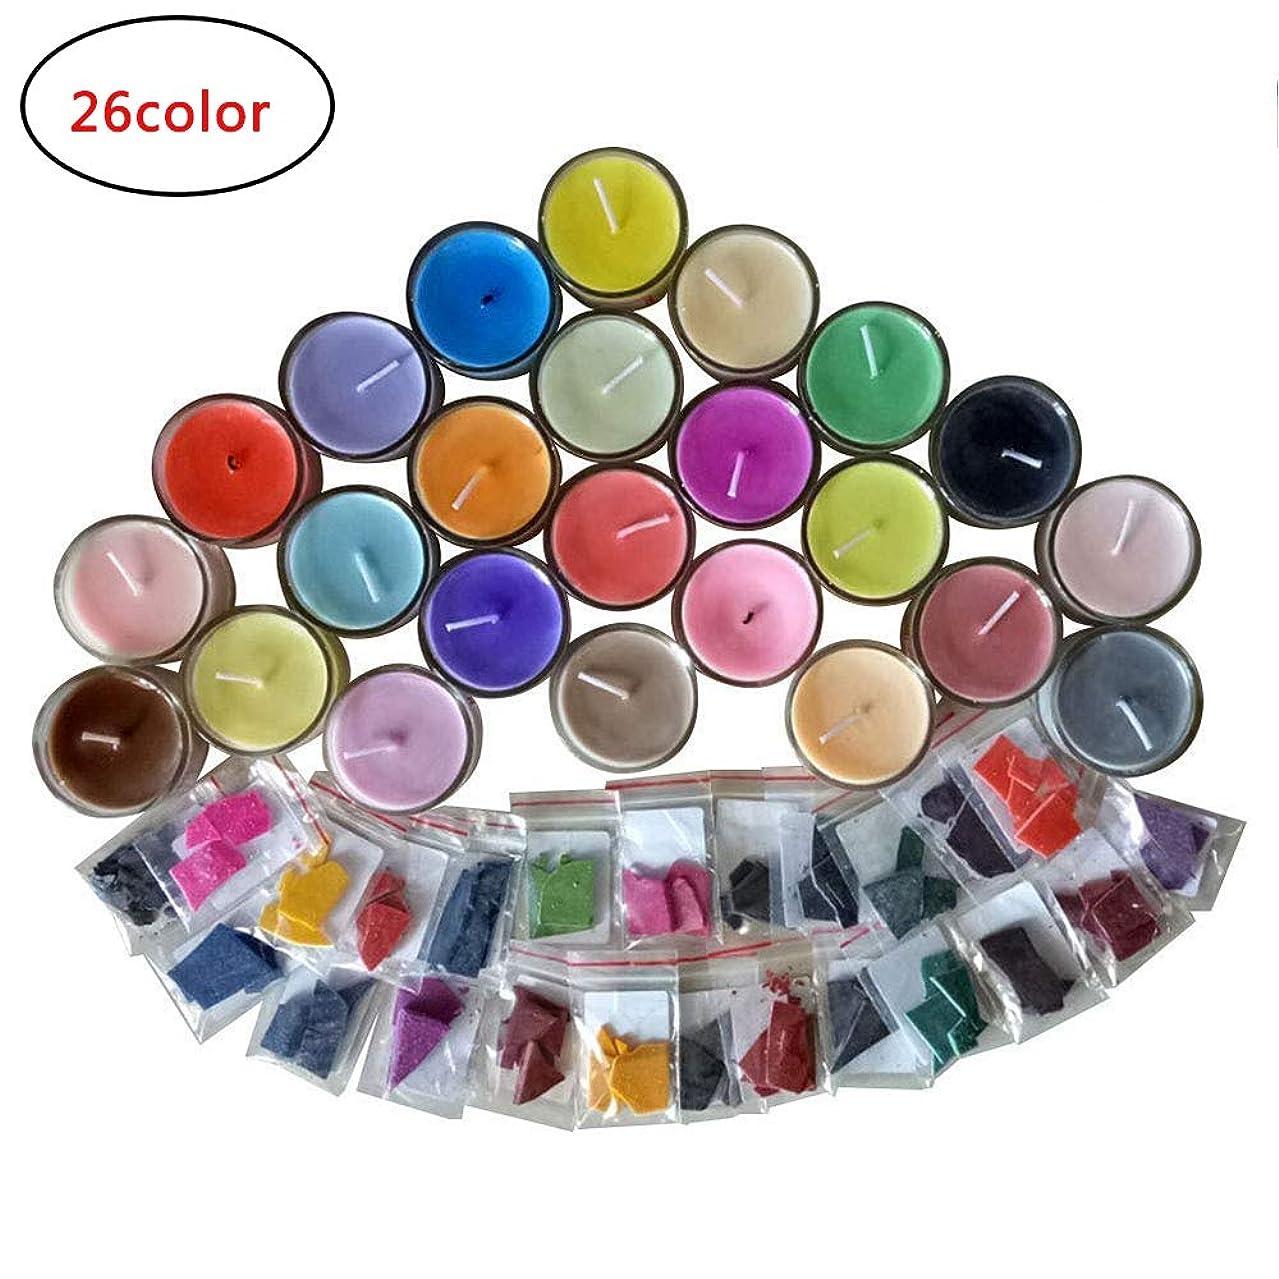 LFM Wax Dye-DIY Candle Dye-Dye Flakes for Candle Making Dye Kit-Soy Dye for Candle Molds-26 Dye Colors-0.15 Ounce Each Color